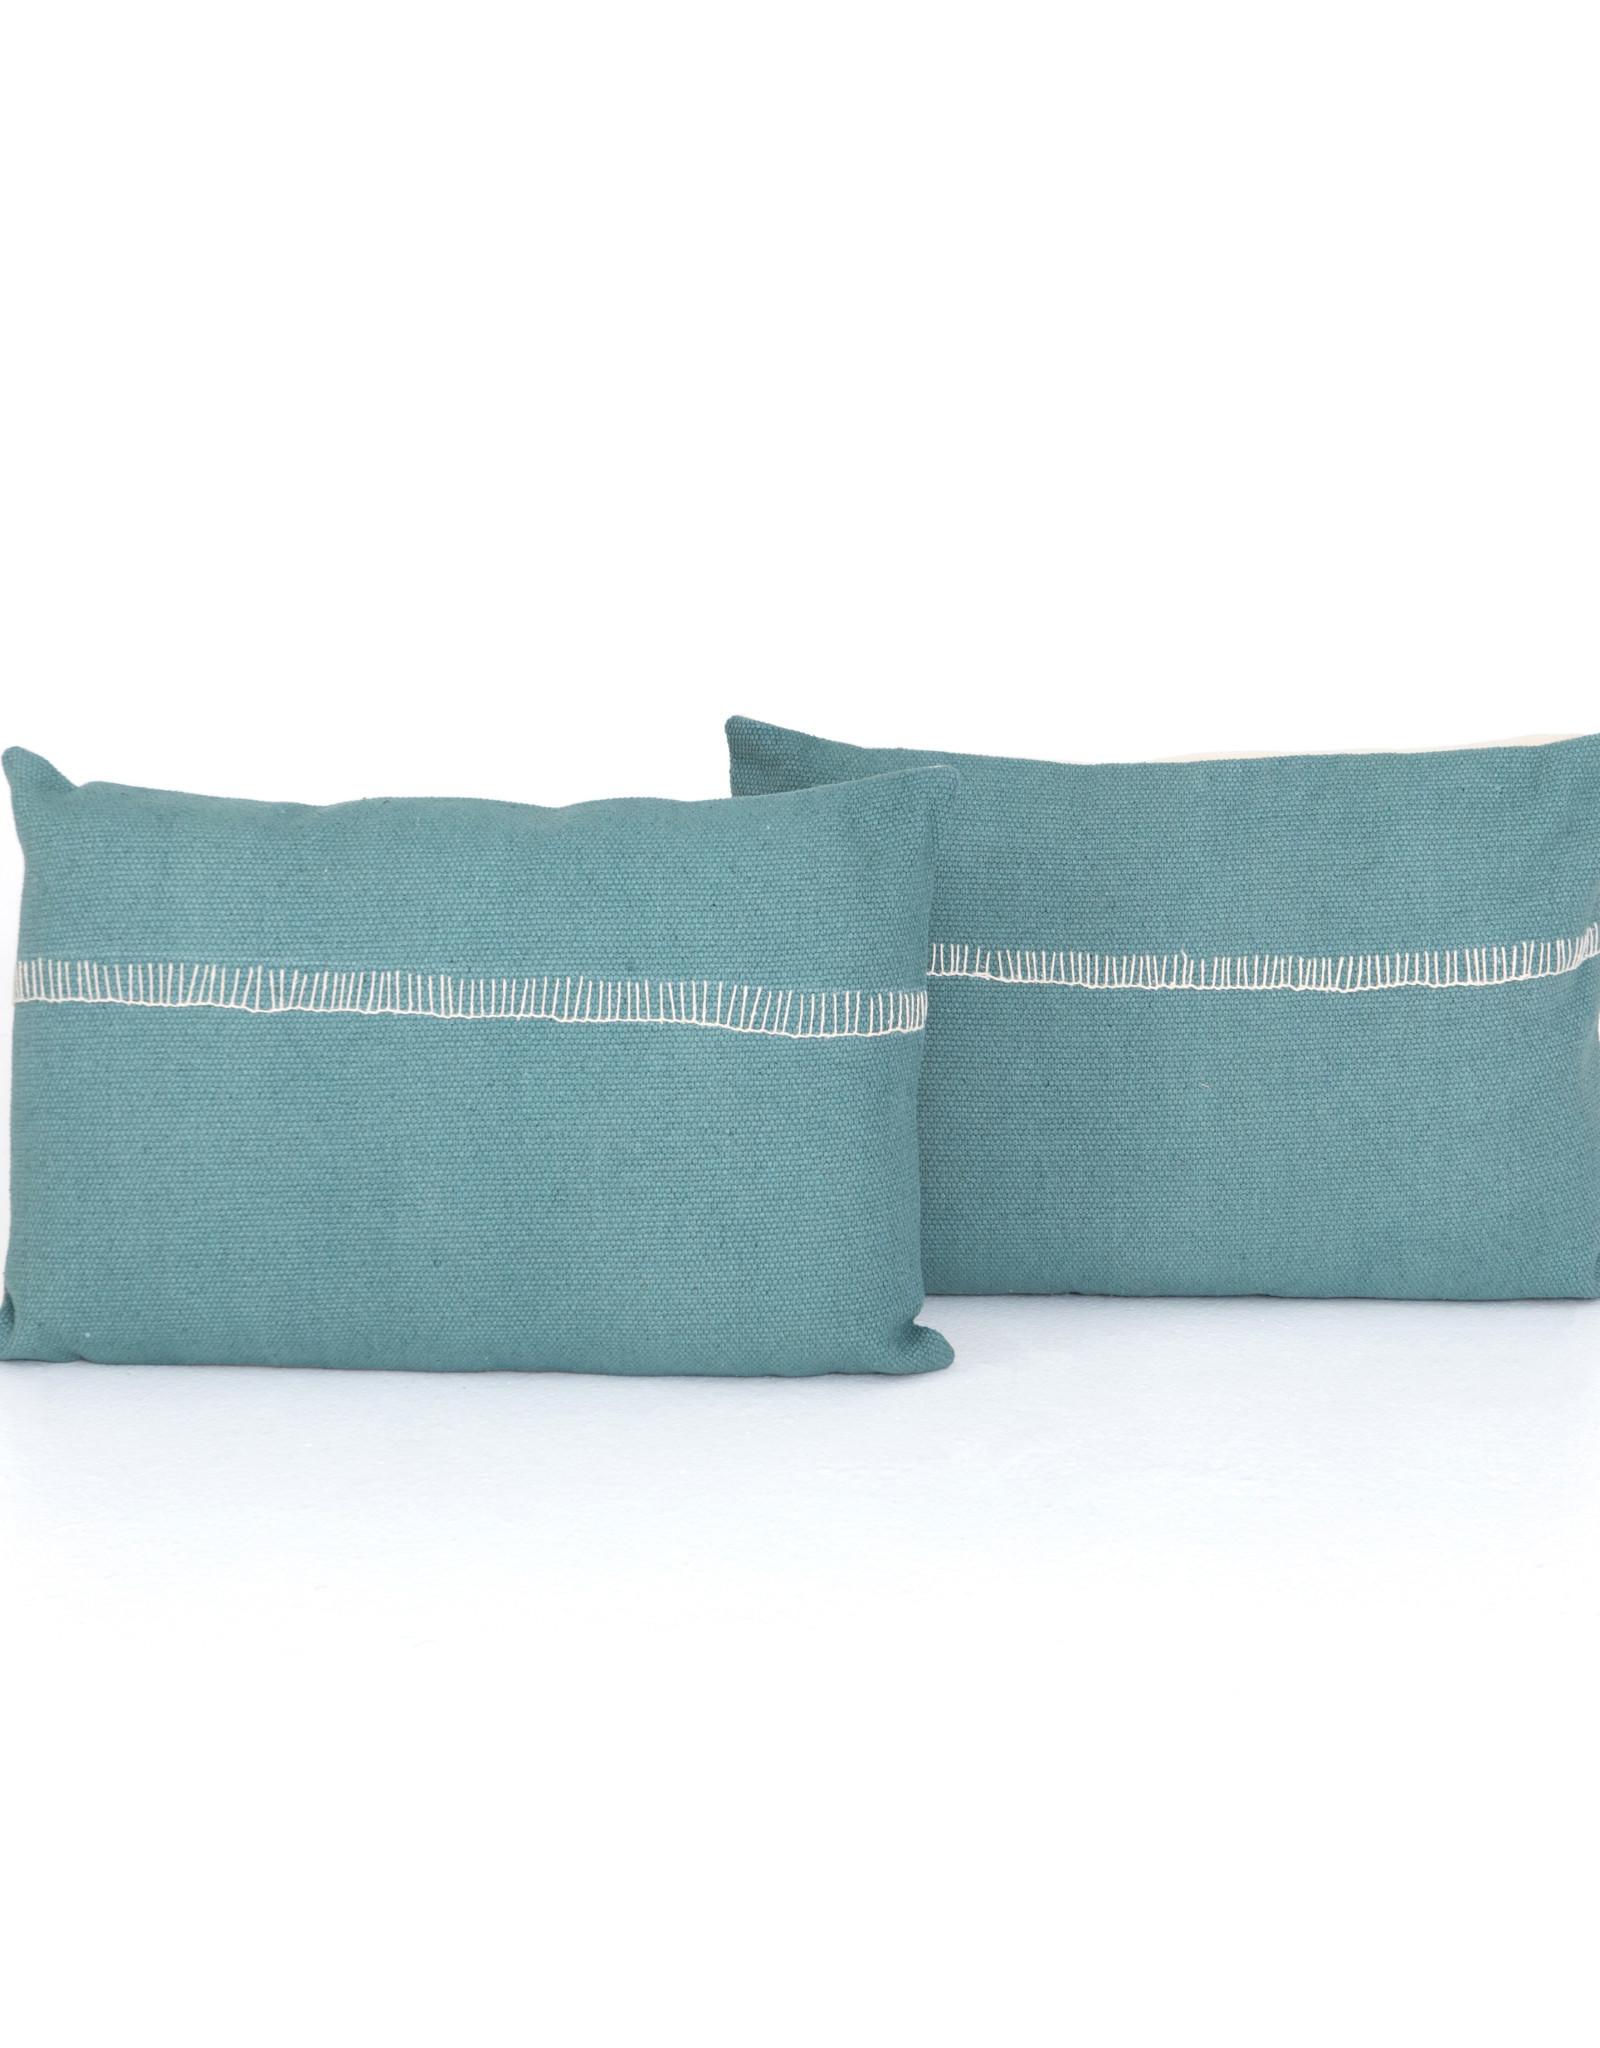 "Pillows Aqua with Stitch Accent 16"" x 24"""